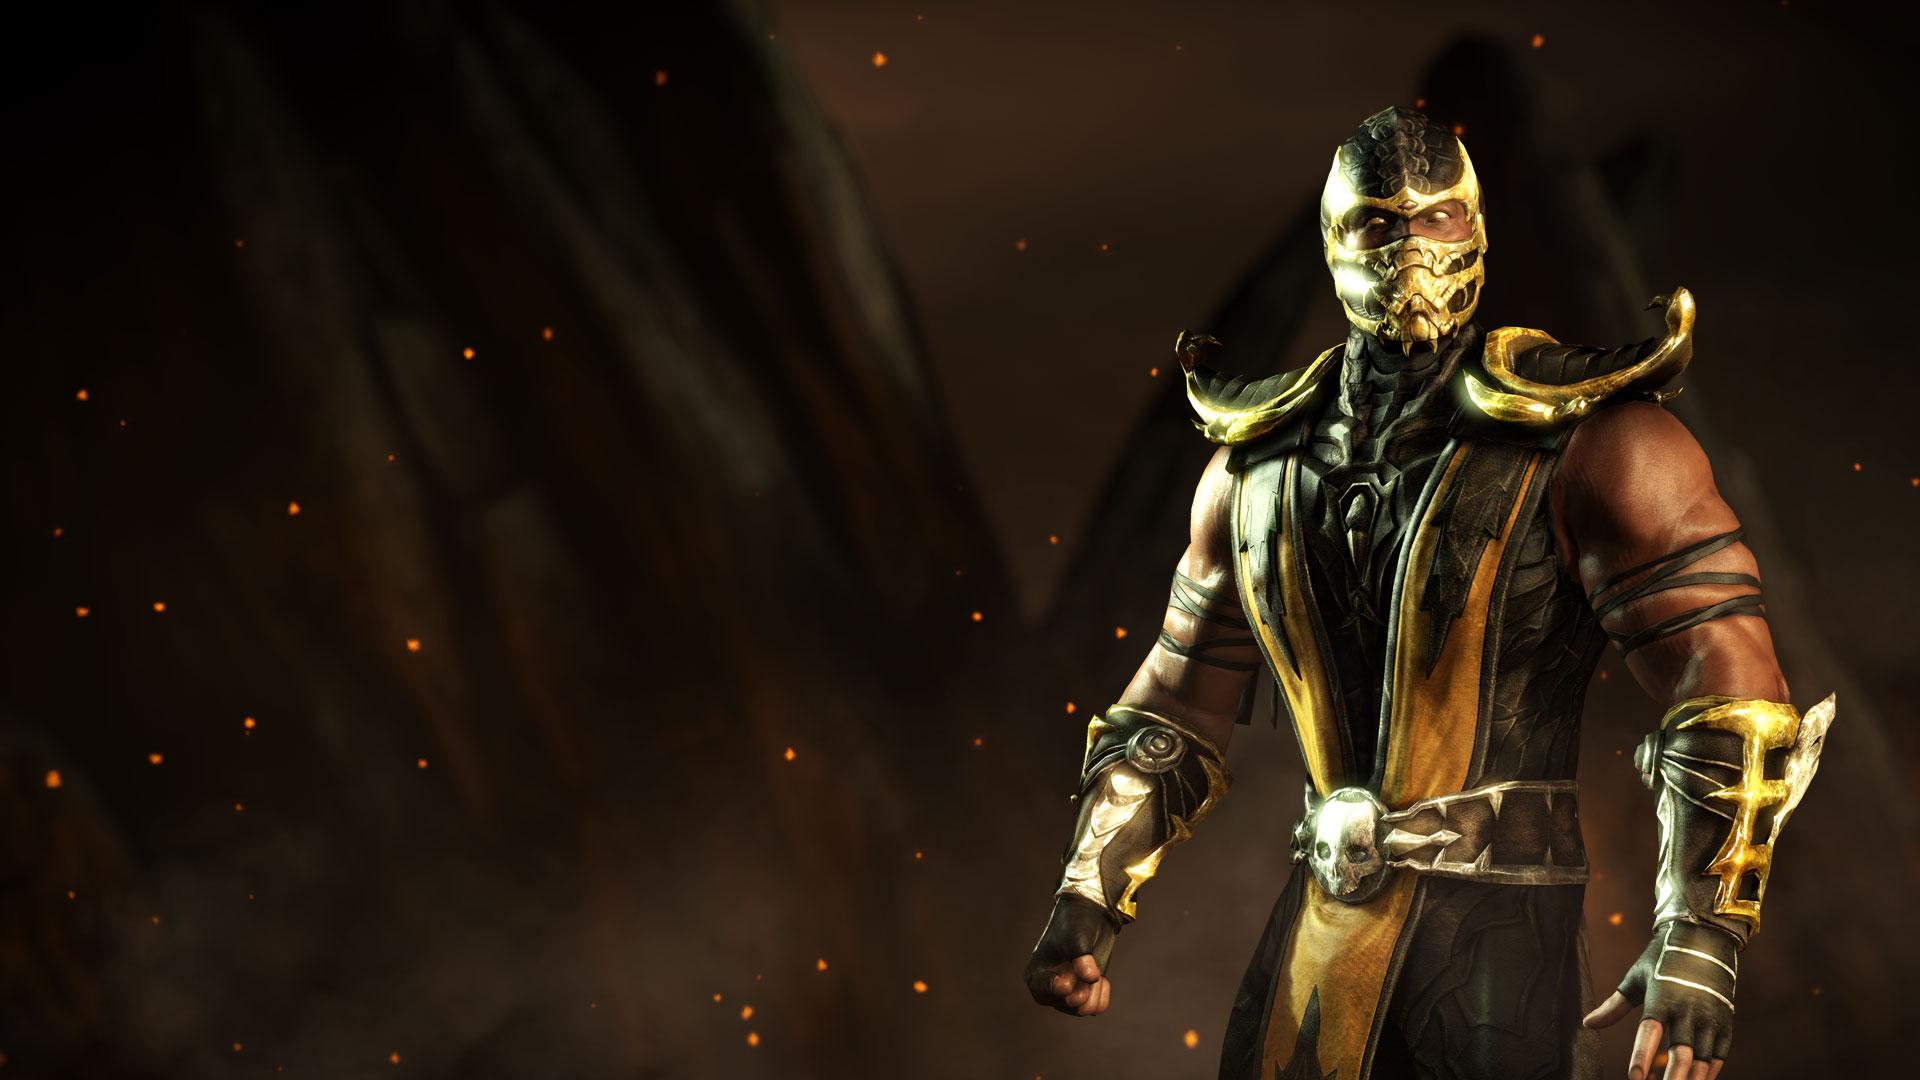 MKWarehouse Mortal Kombat X Scorpion 1920x1080